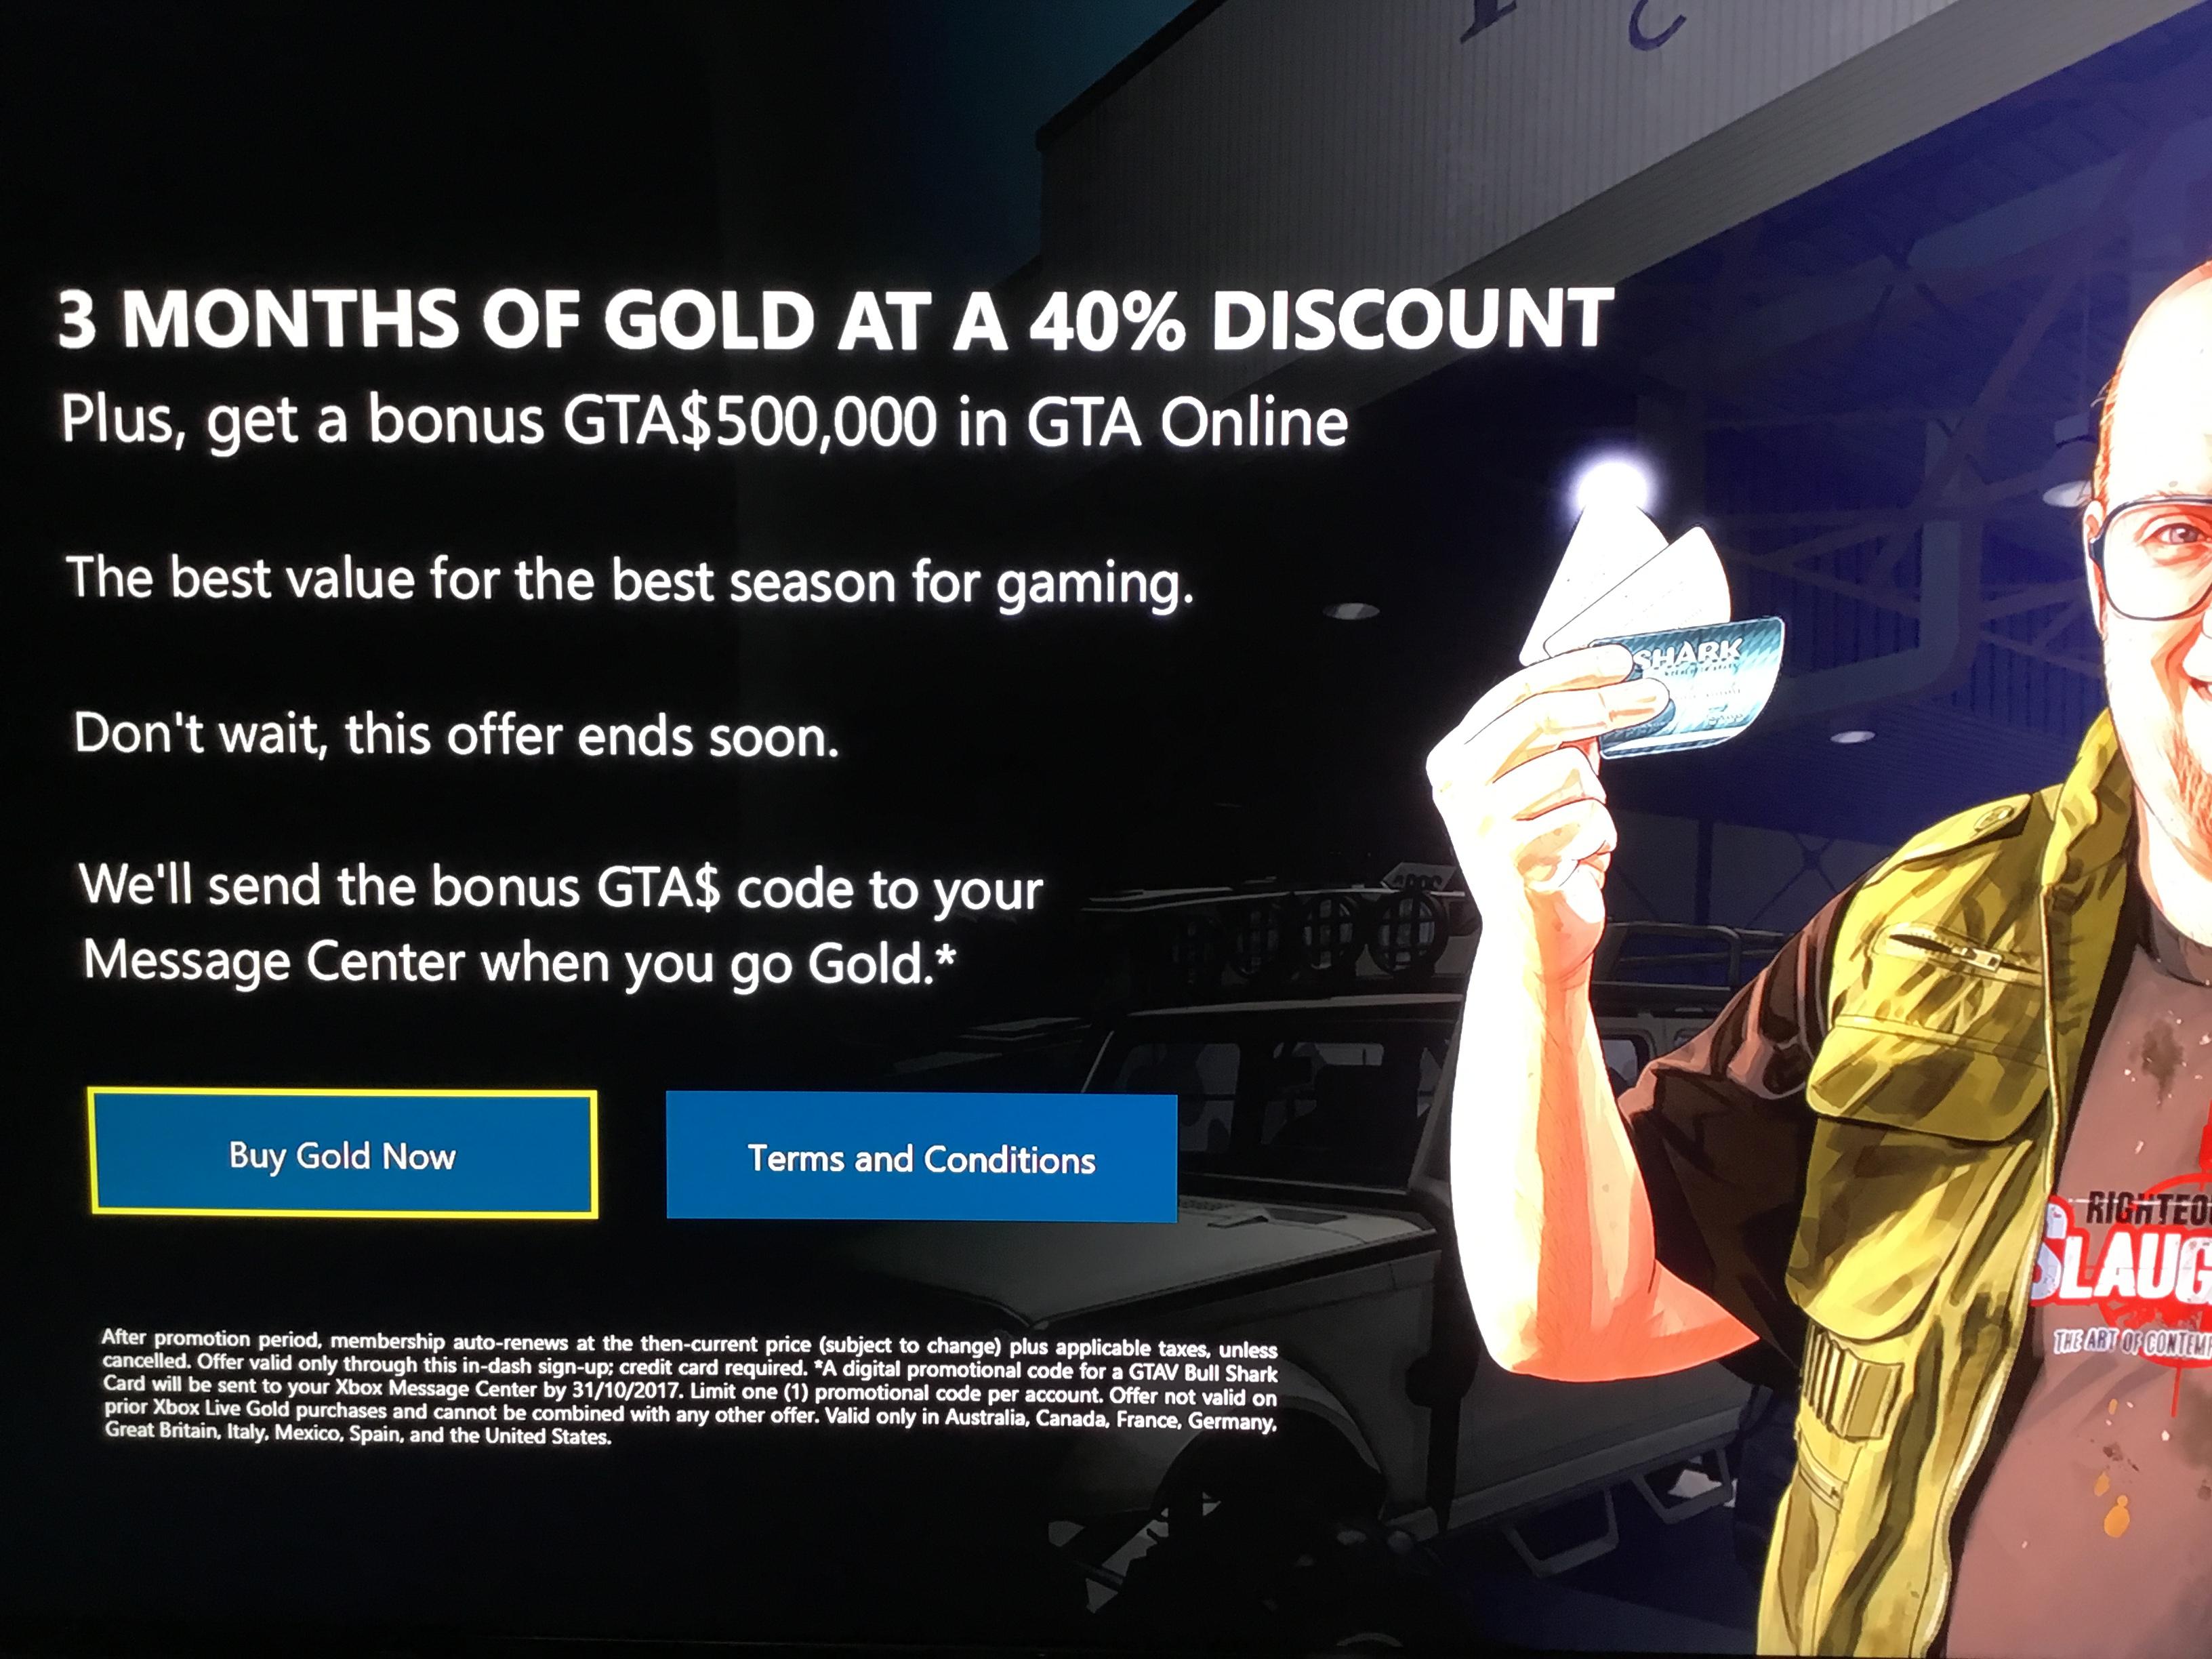 Xbox Live 3 month plus GTA$500,000 cash £8.99 Xbox dashboard